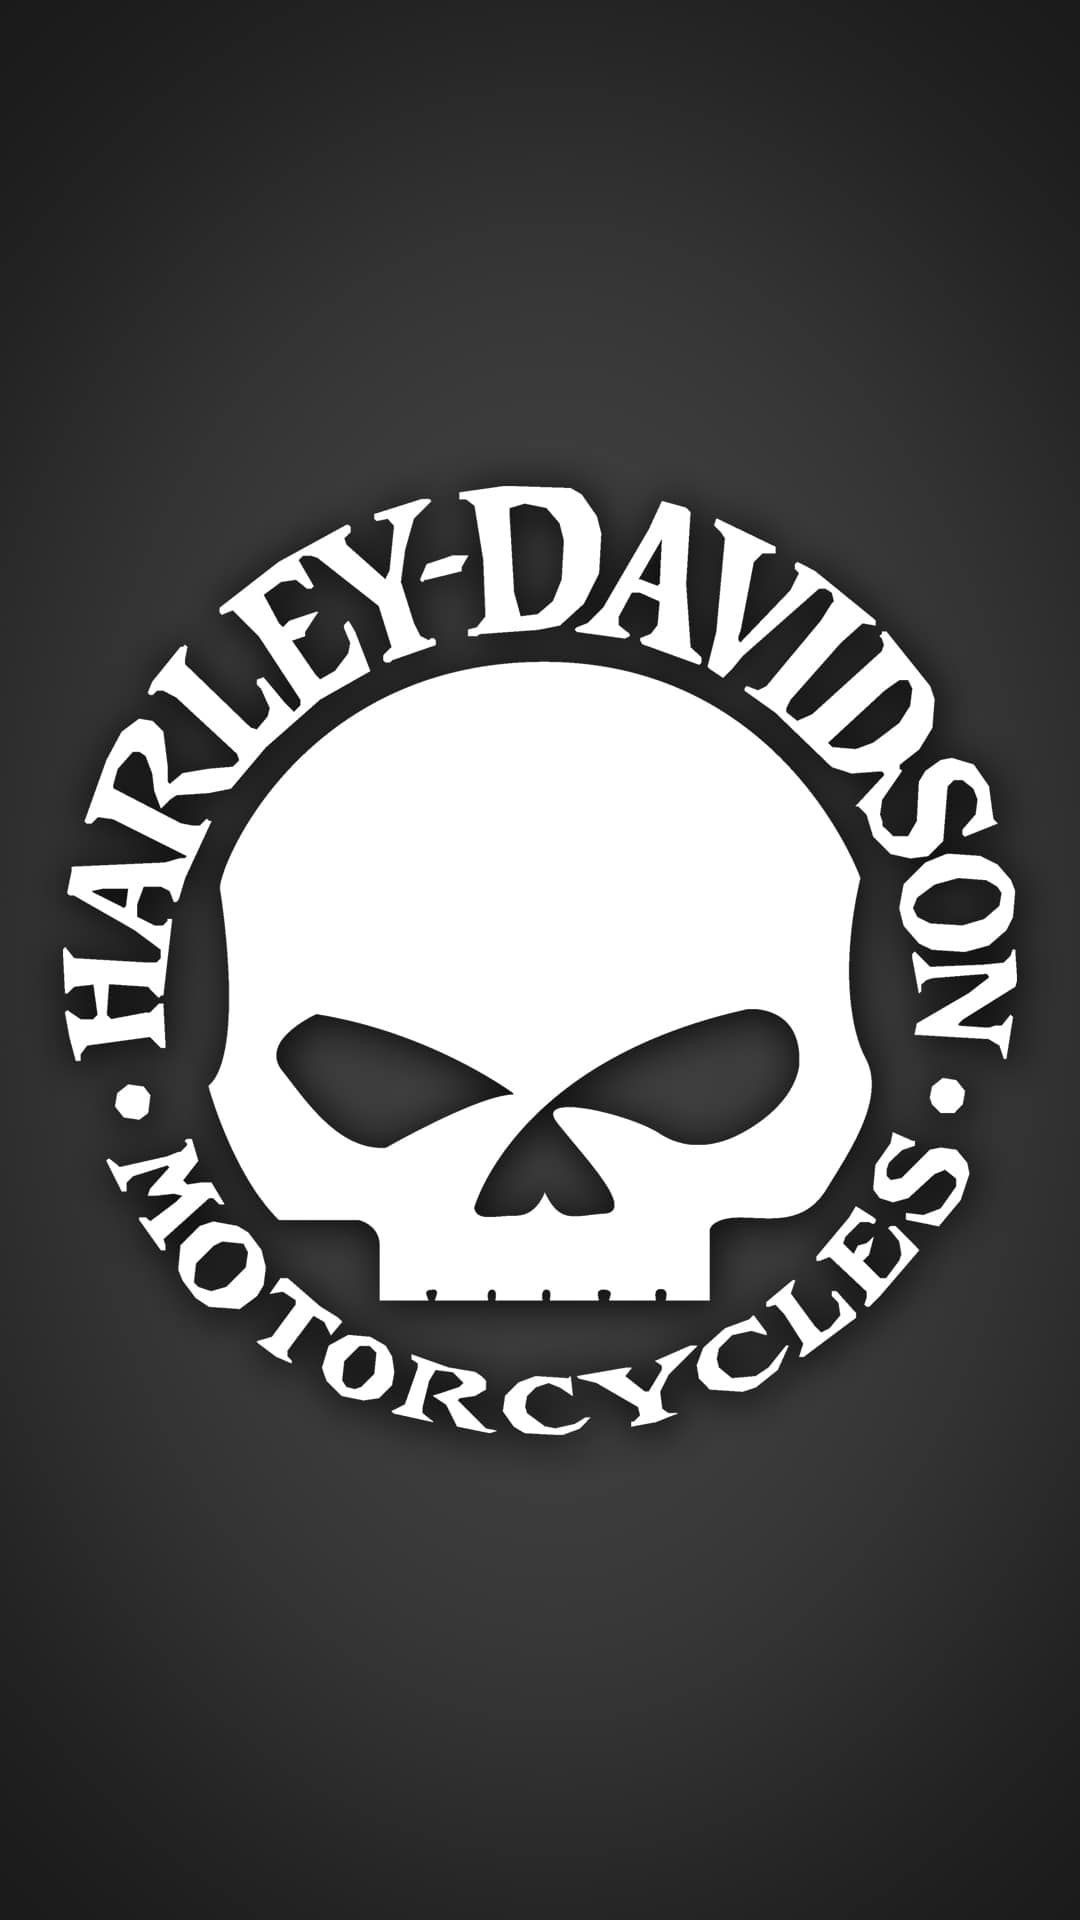 Harley Davidson Iphone Wallpaper Ipcwallpapers In 2020 Harley Davidson Stickers Harley Davidson Wallpaper Harley Davidson Decals